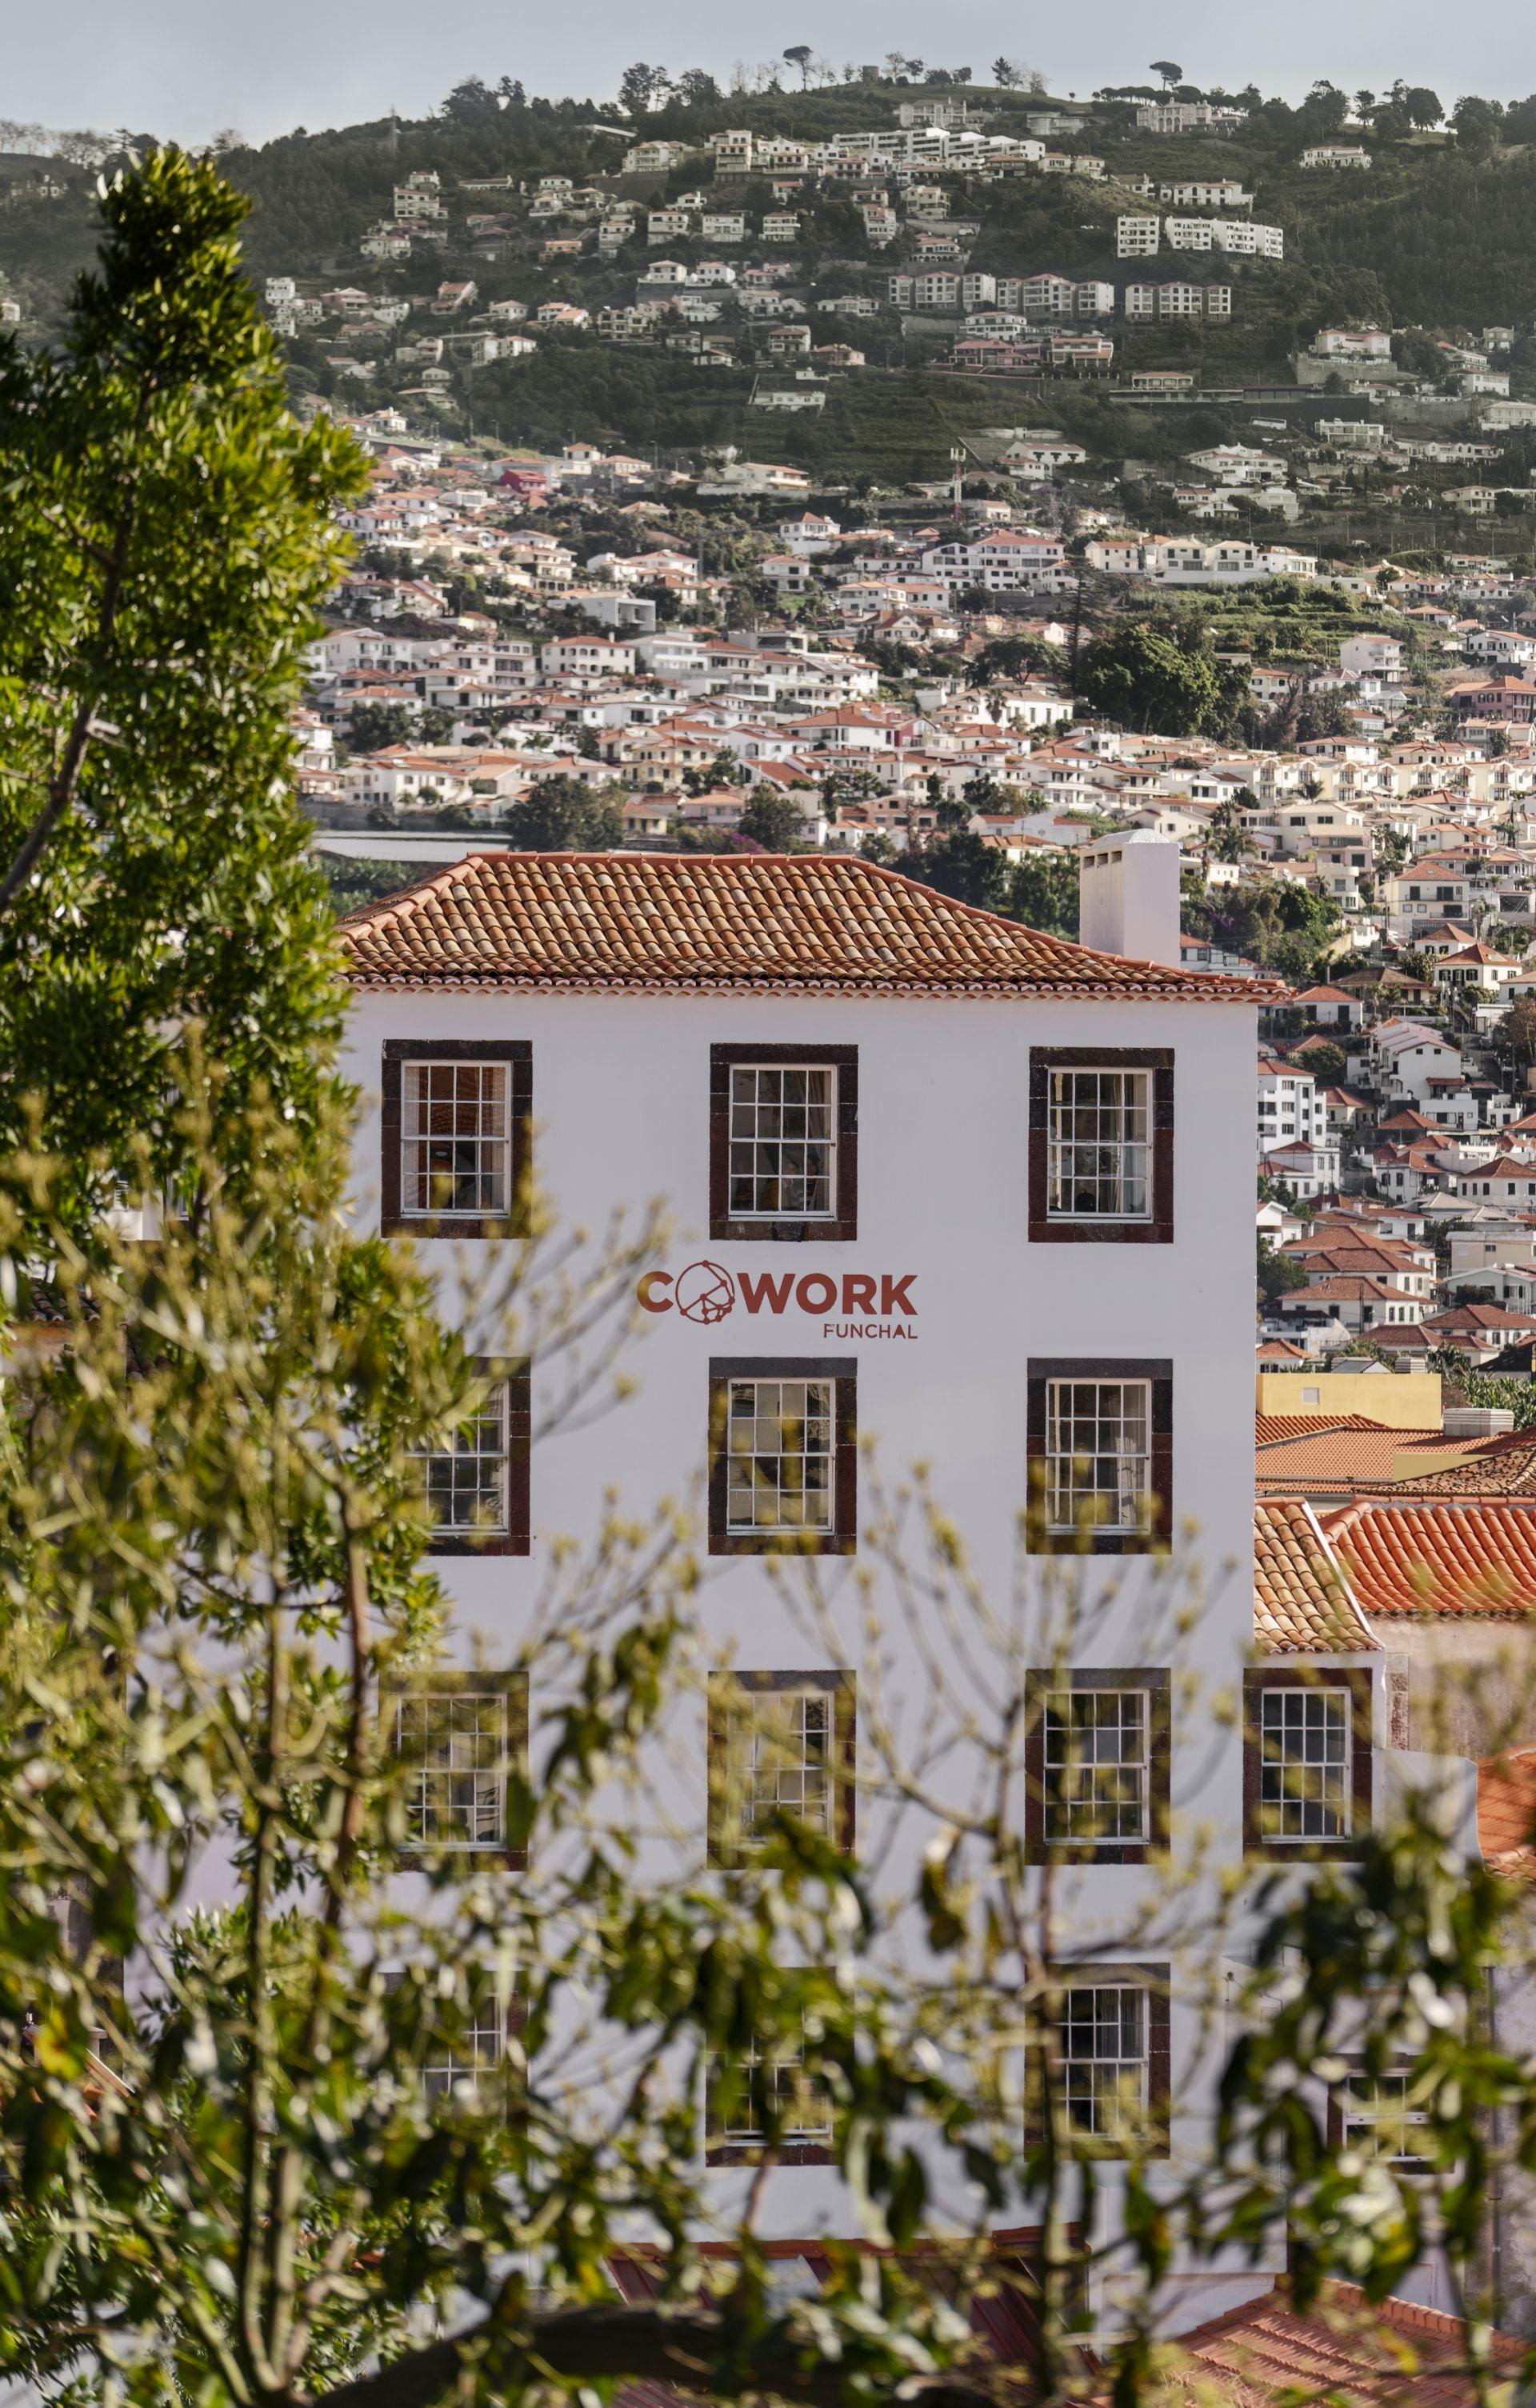 Cowork Funchal, Funchal